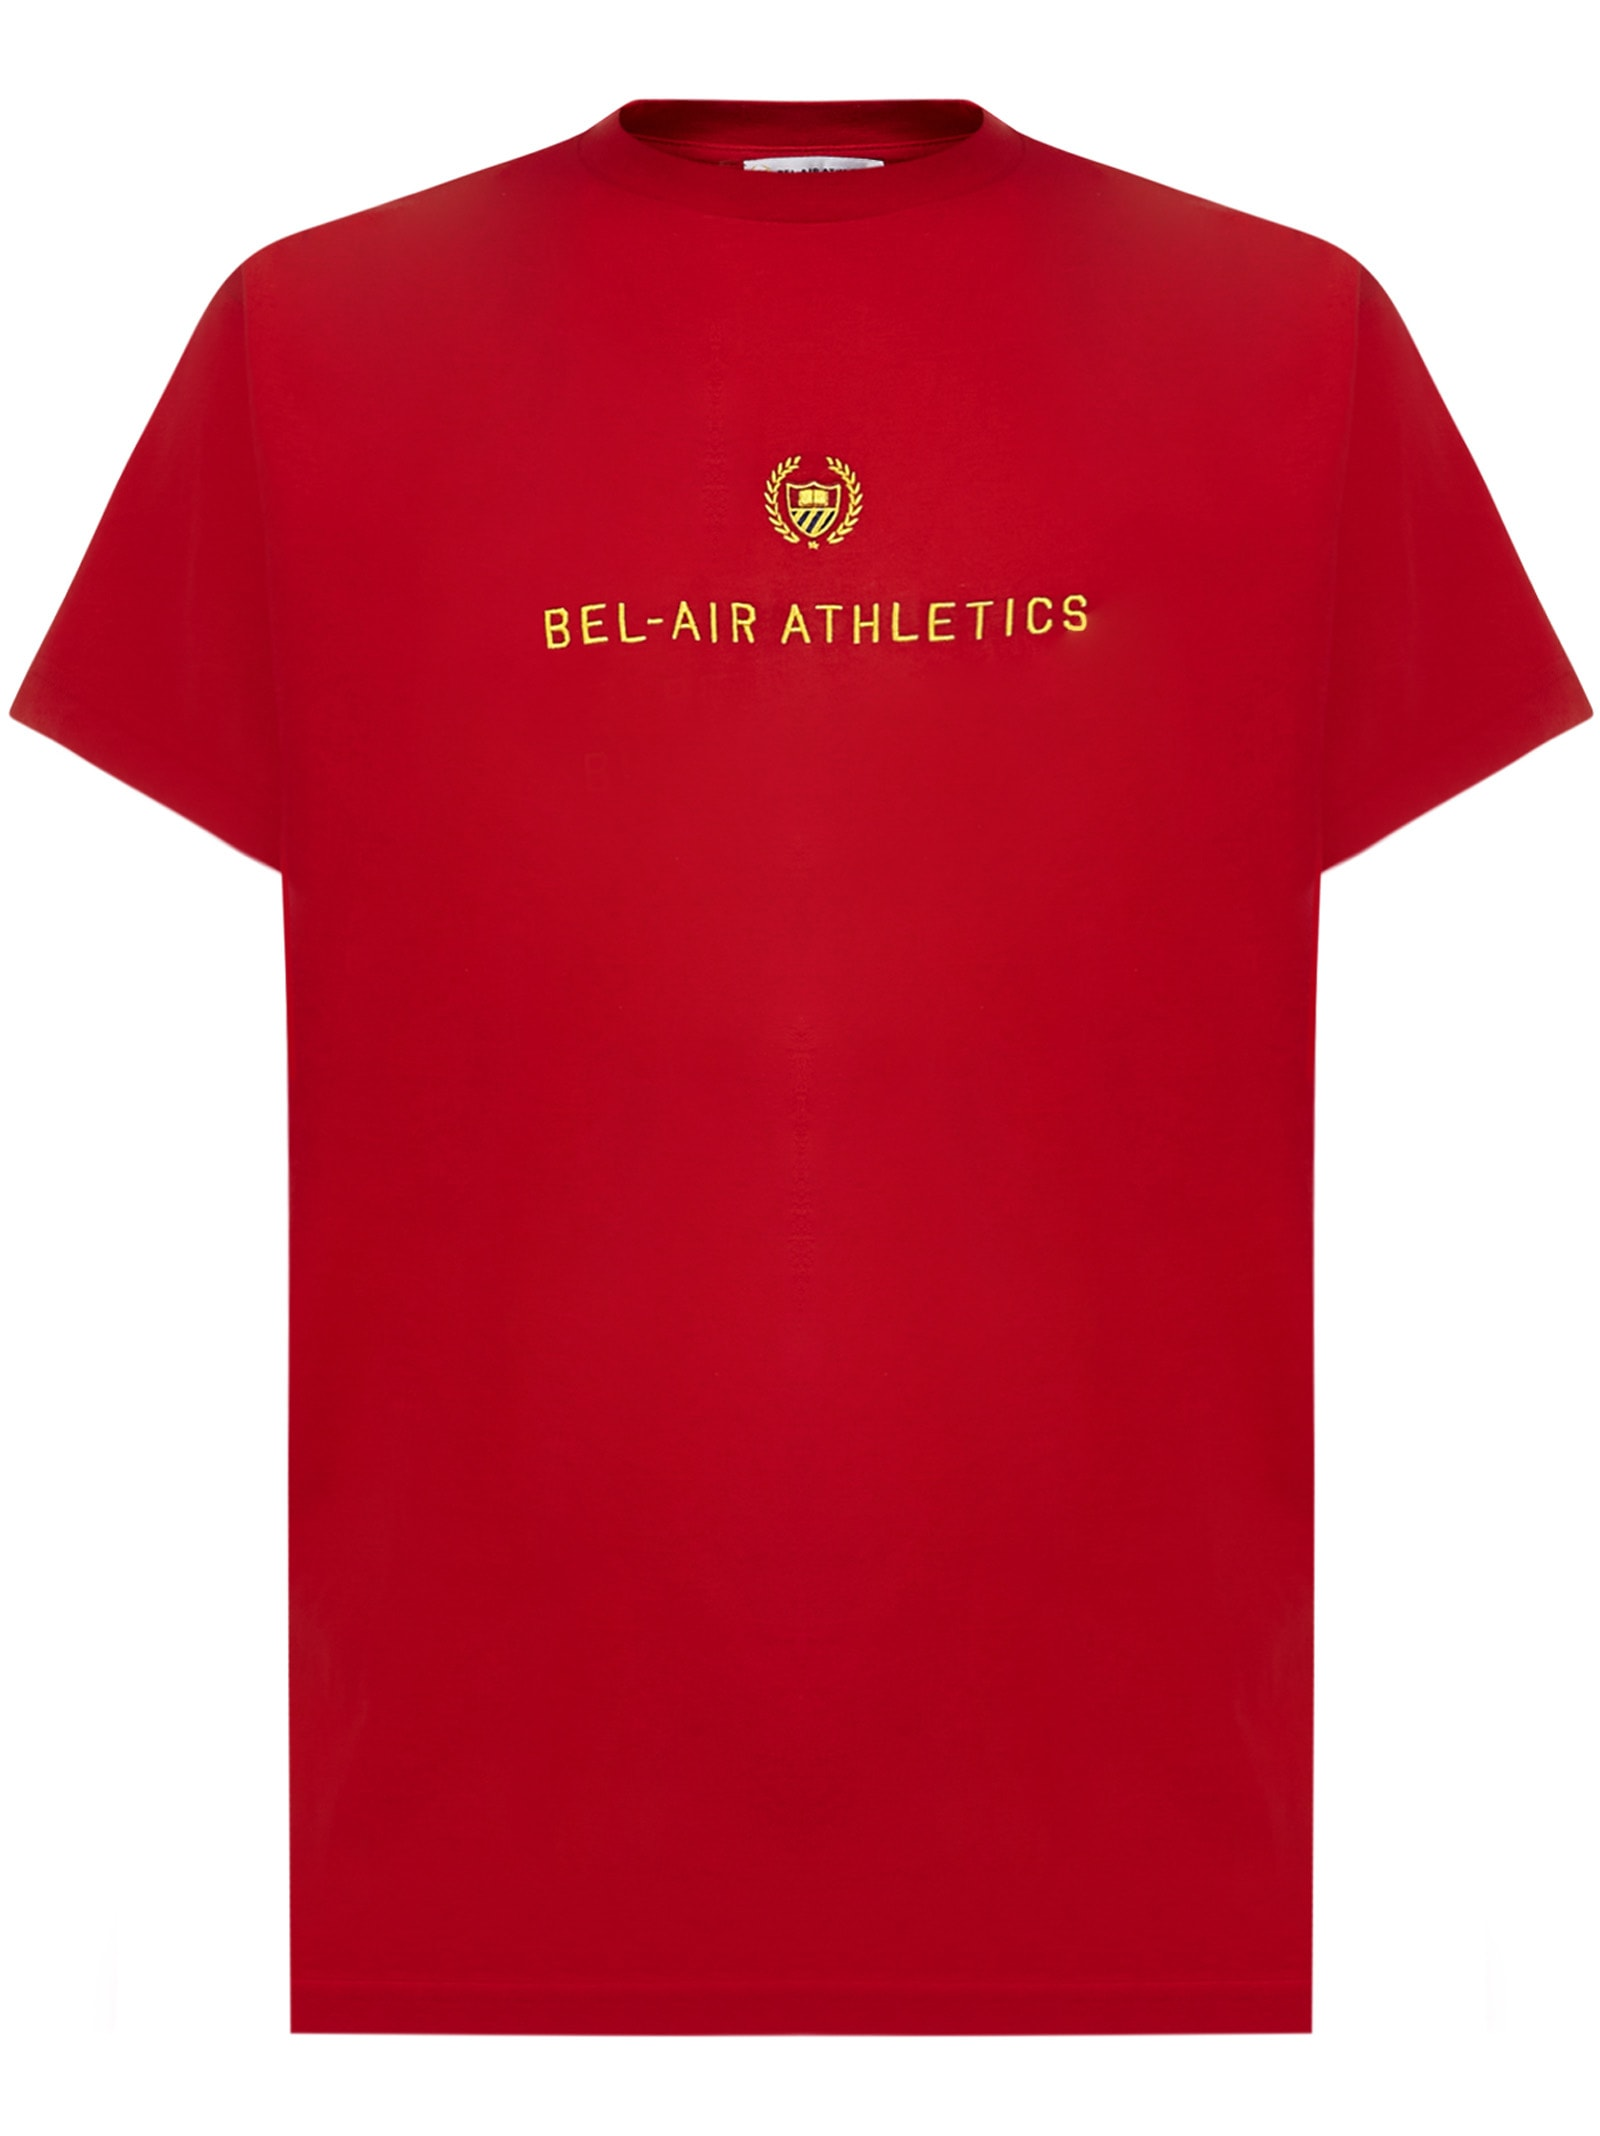 Bel-air Athletics T-shirt